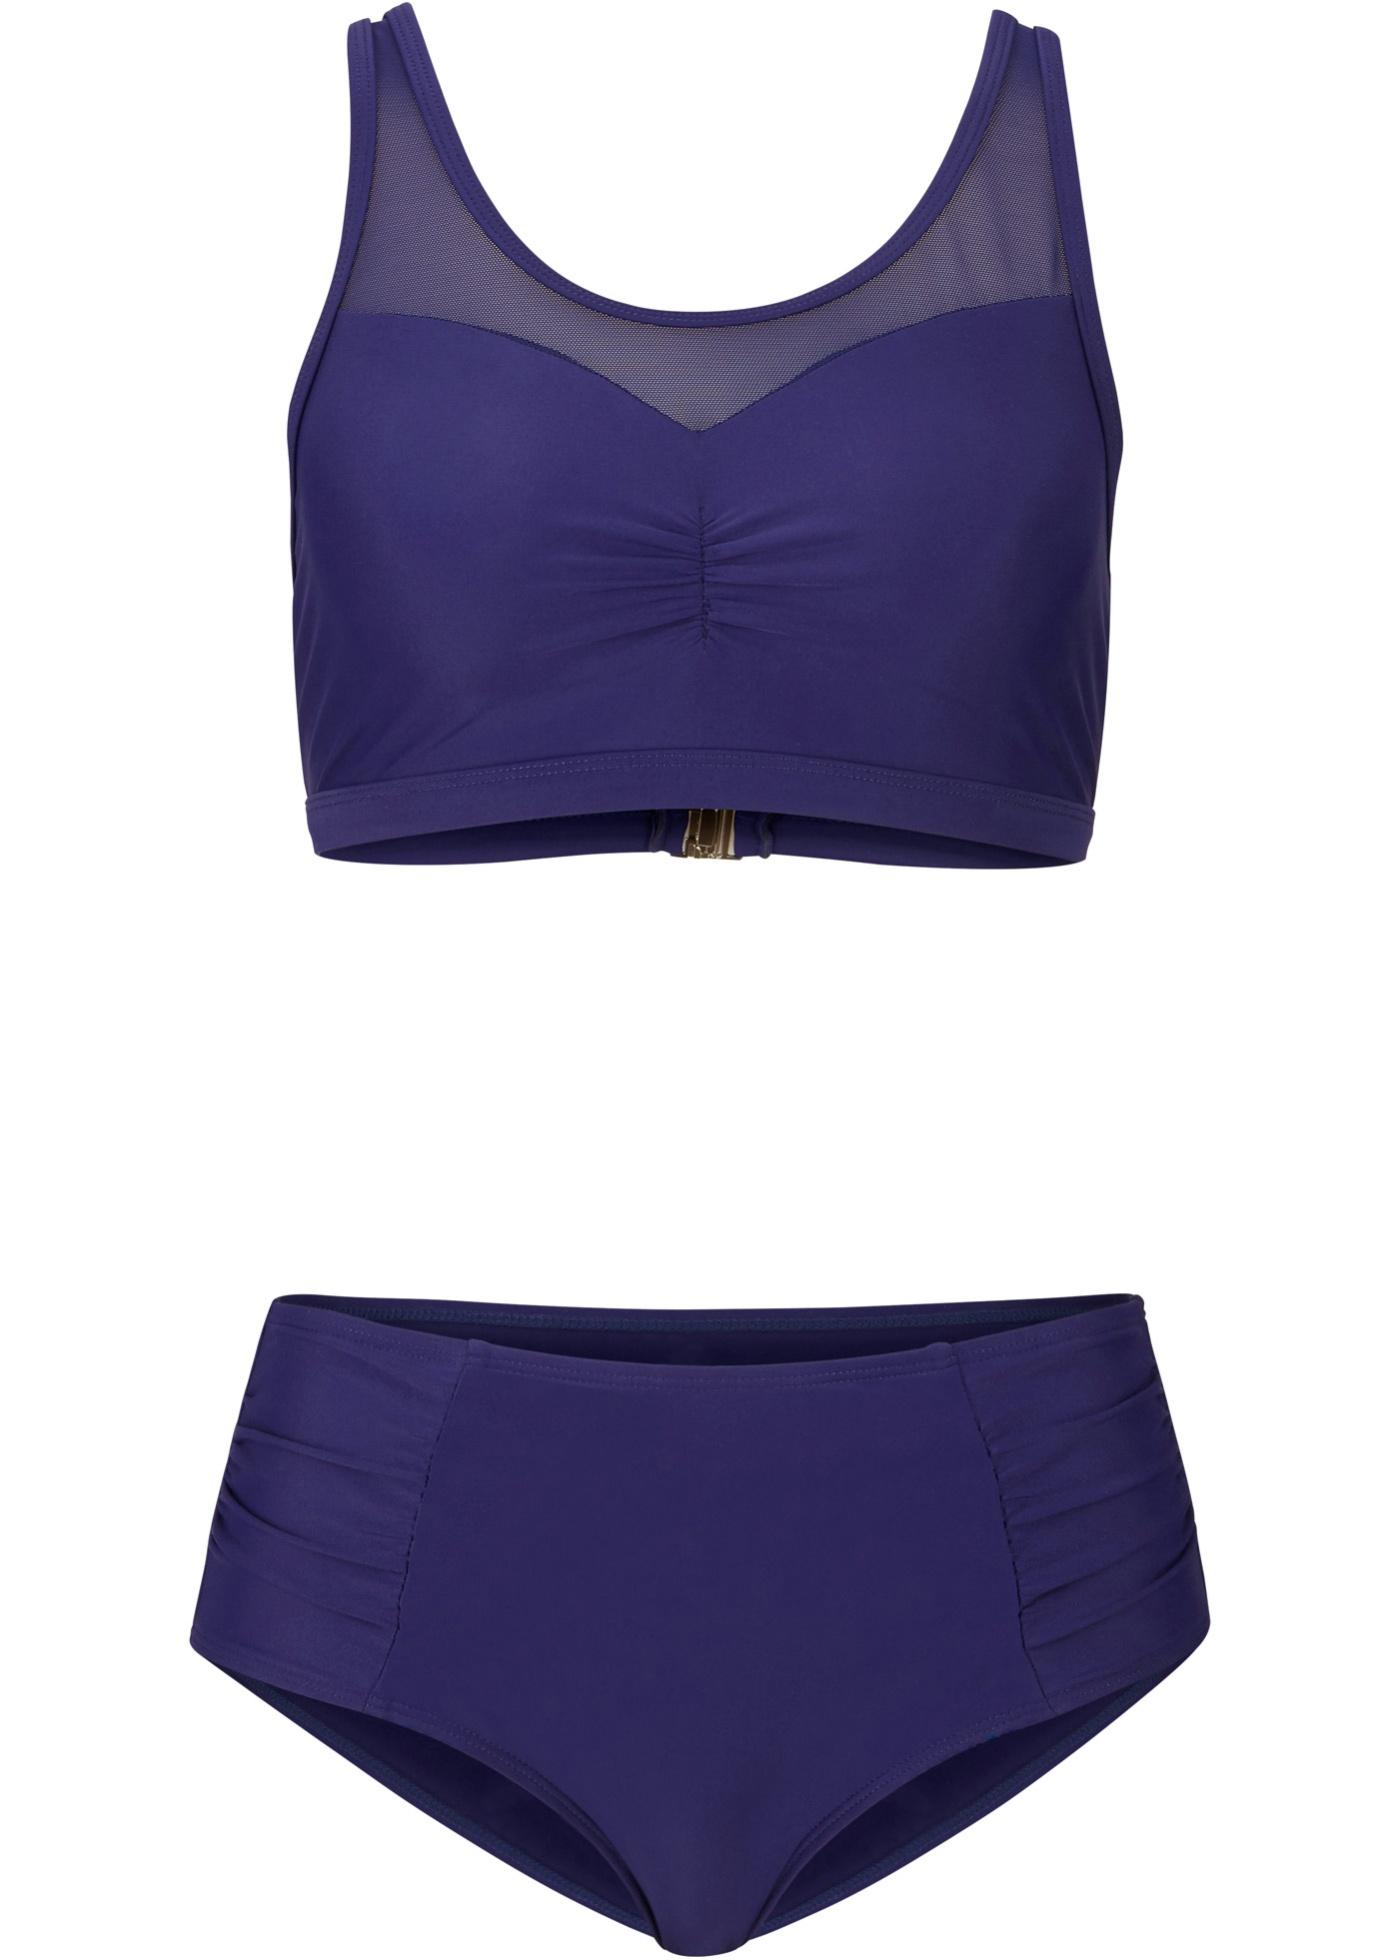 Bikini brassière minimiseur (Ens. 2 pces.)